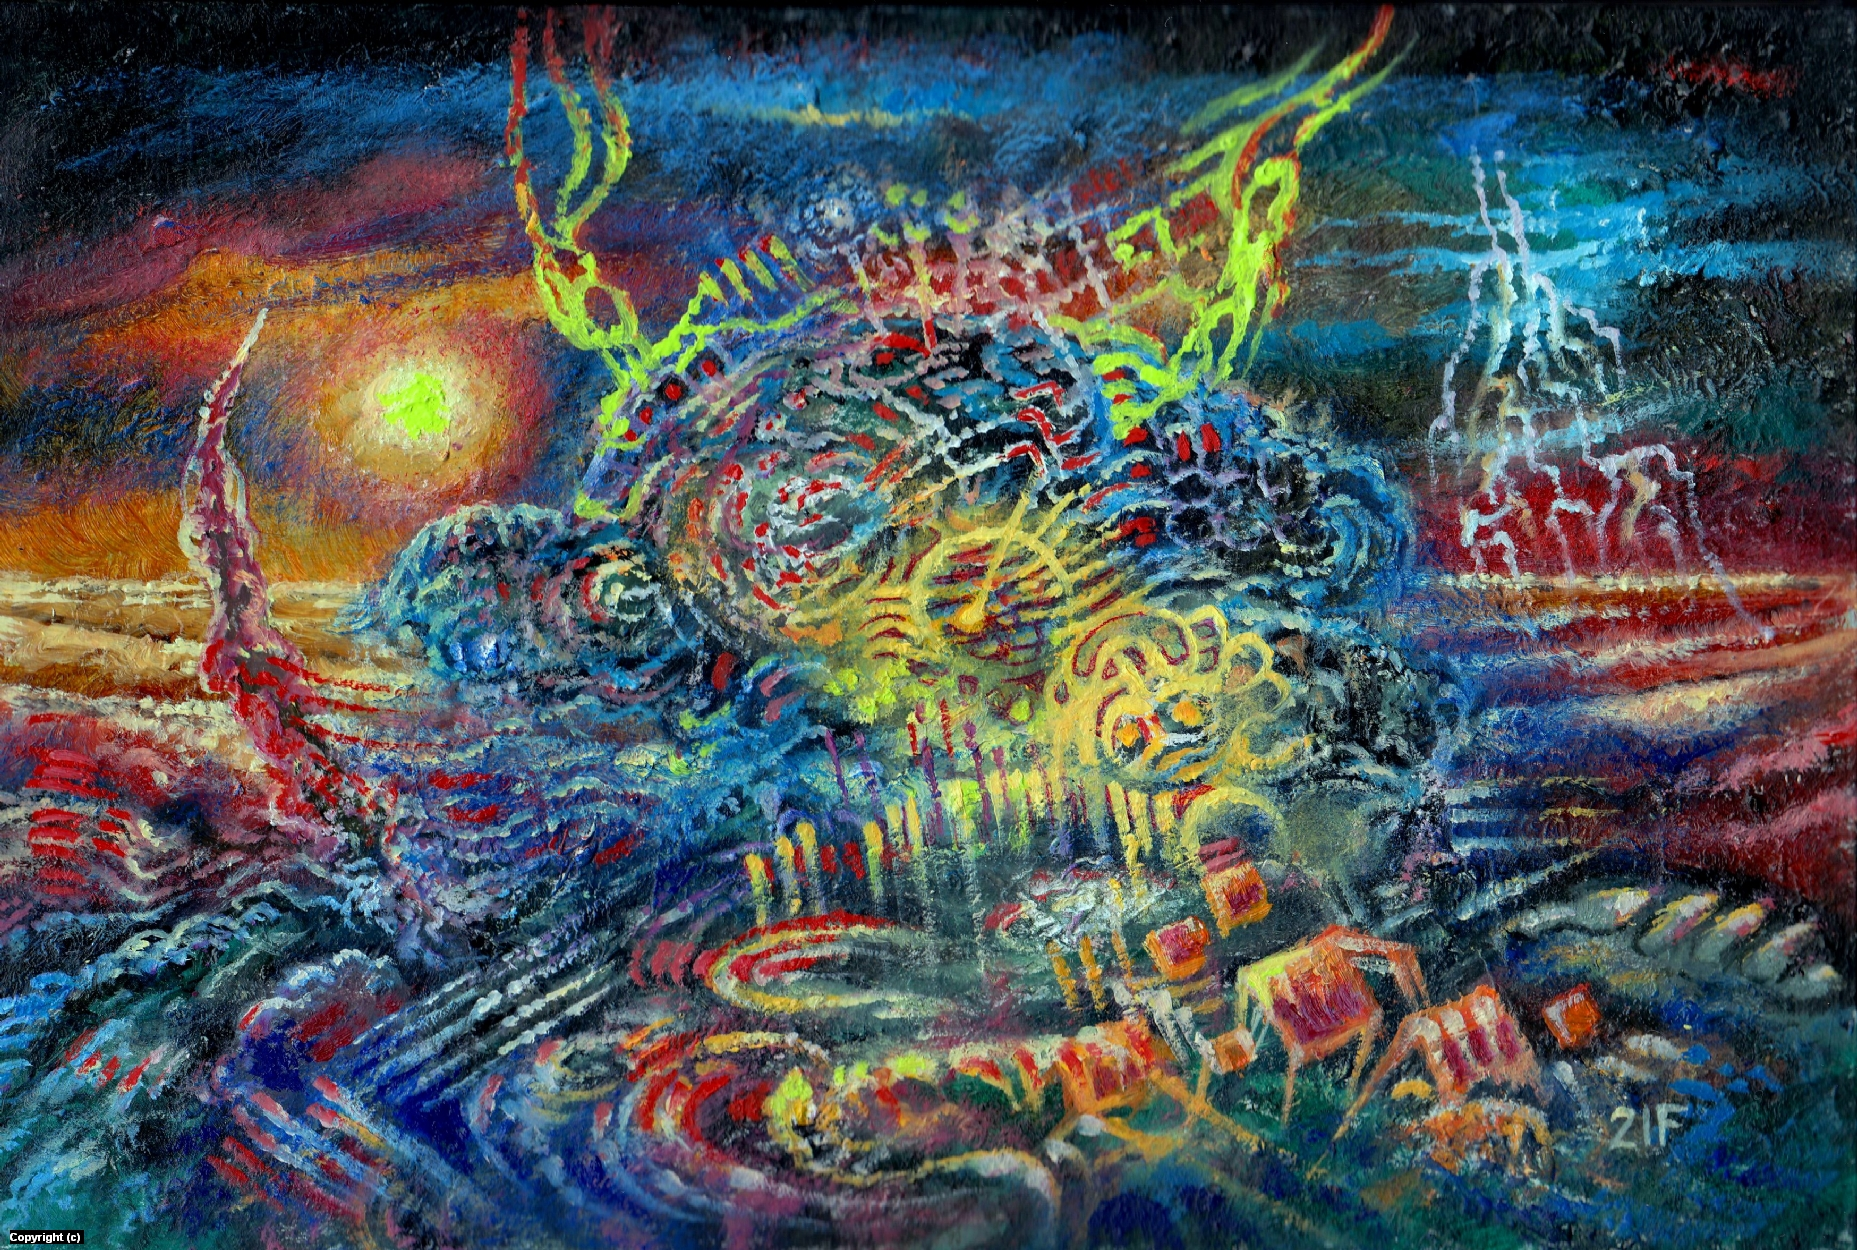 Organism 2. Artwork by Victor Filippsky